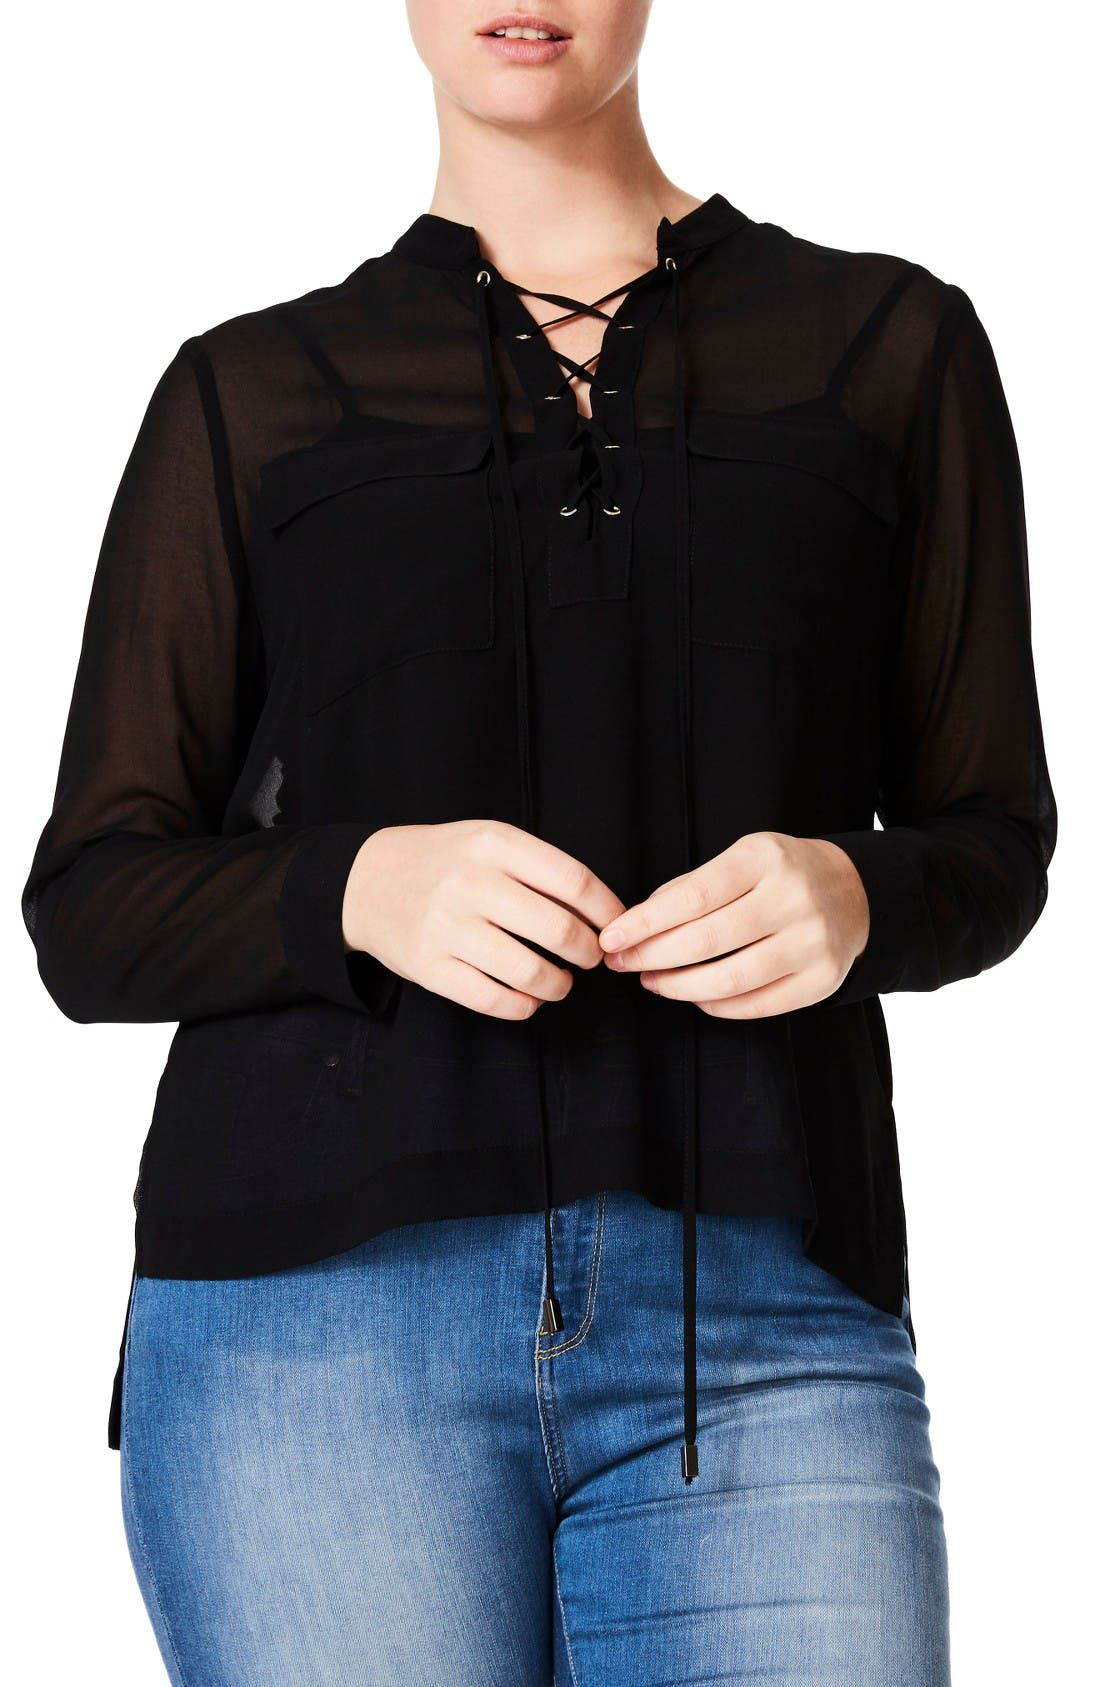 Alternate Image 1 Selected - ELVI Crisscross Lace-Up Blouse (Plus Size)